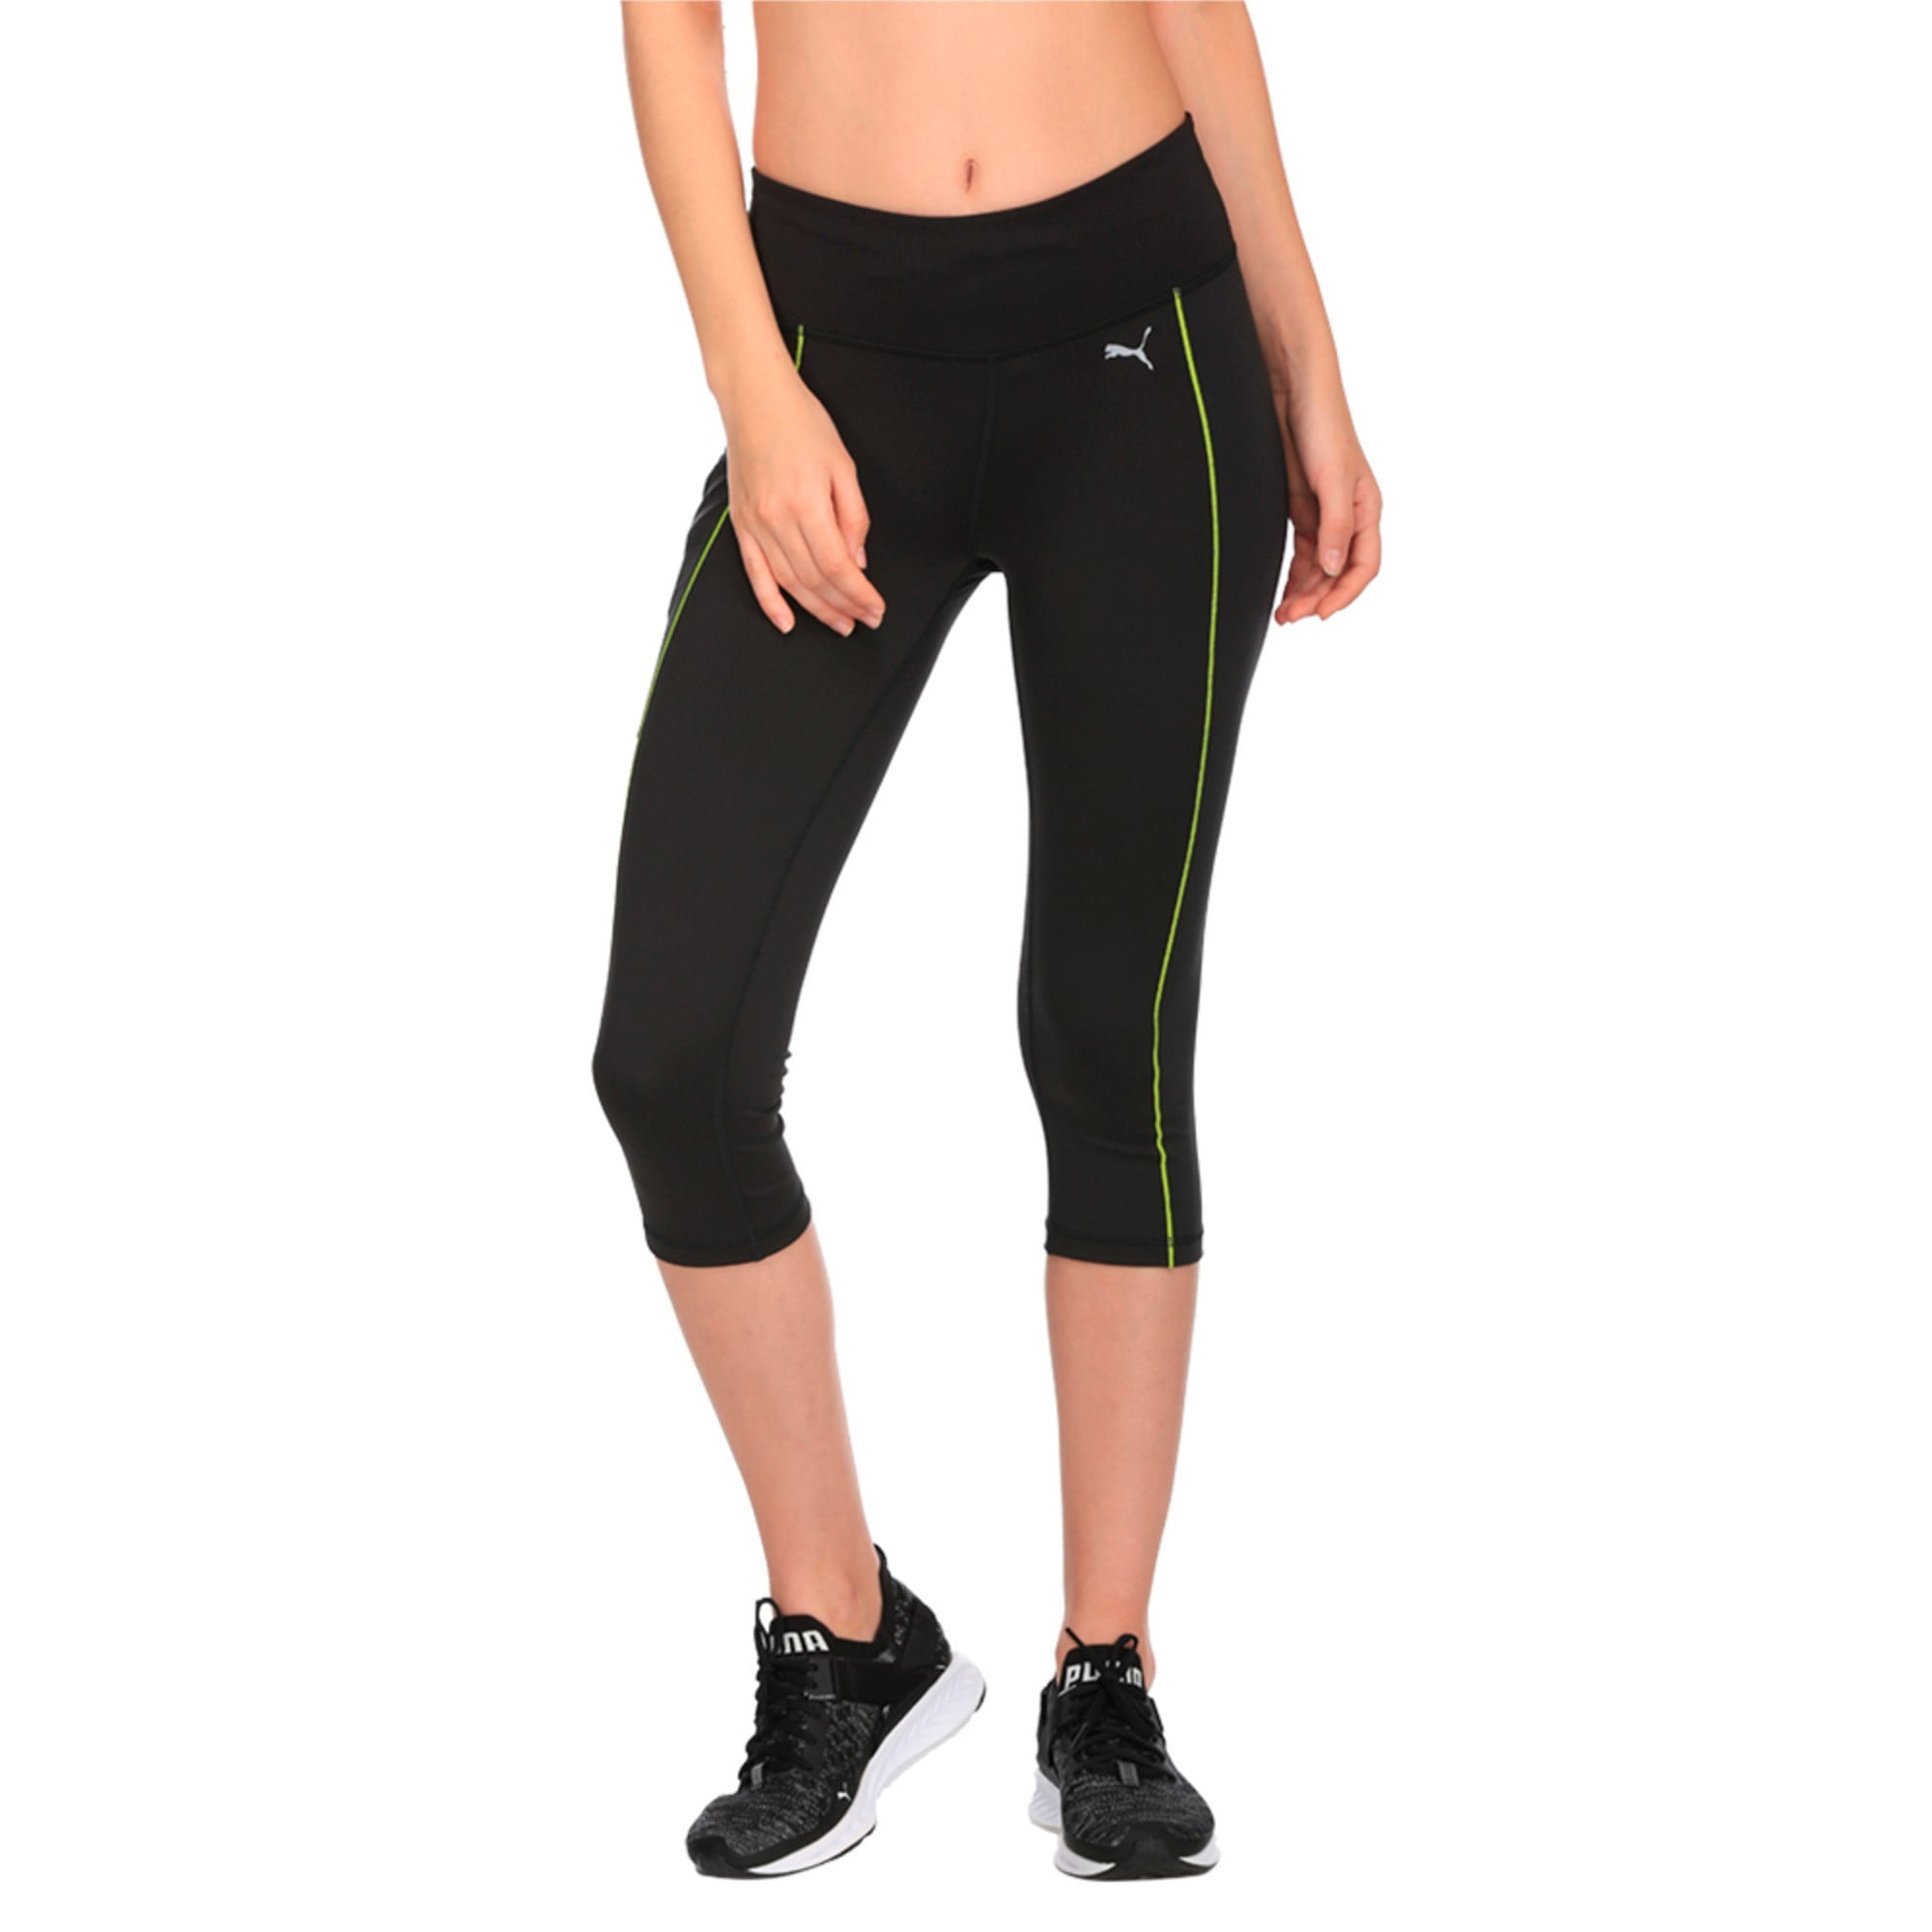 Thumbnail 1 of Running Women's PWRCOOL Speed 3/4 Tights, Puma Black-Nrgy Yellow, medium-IND